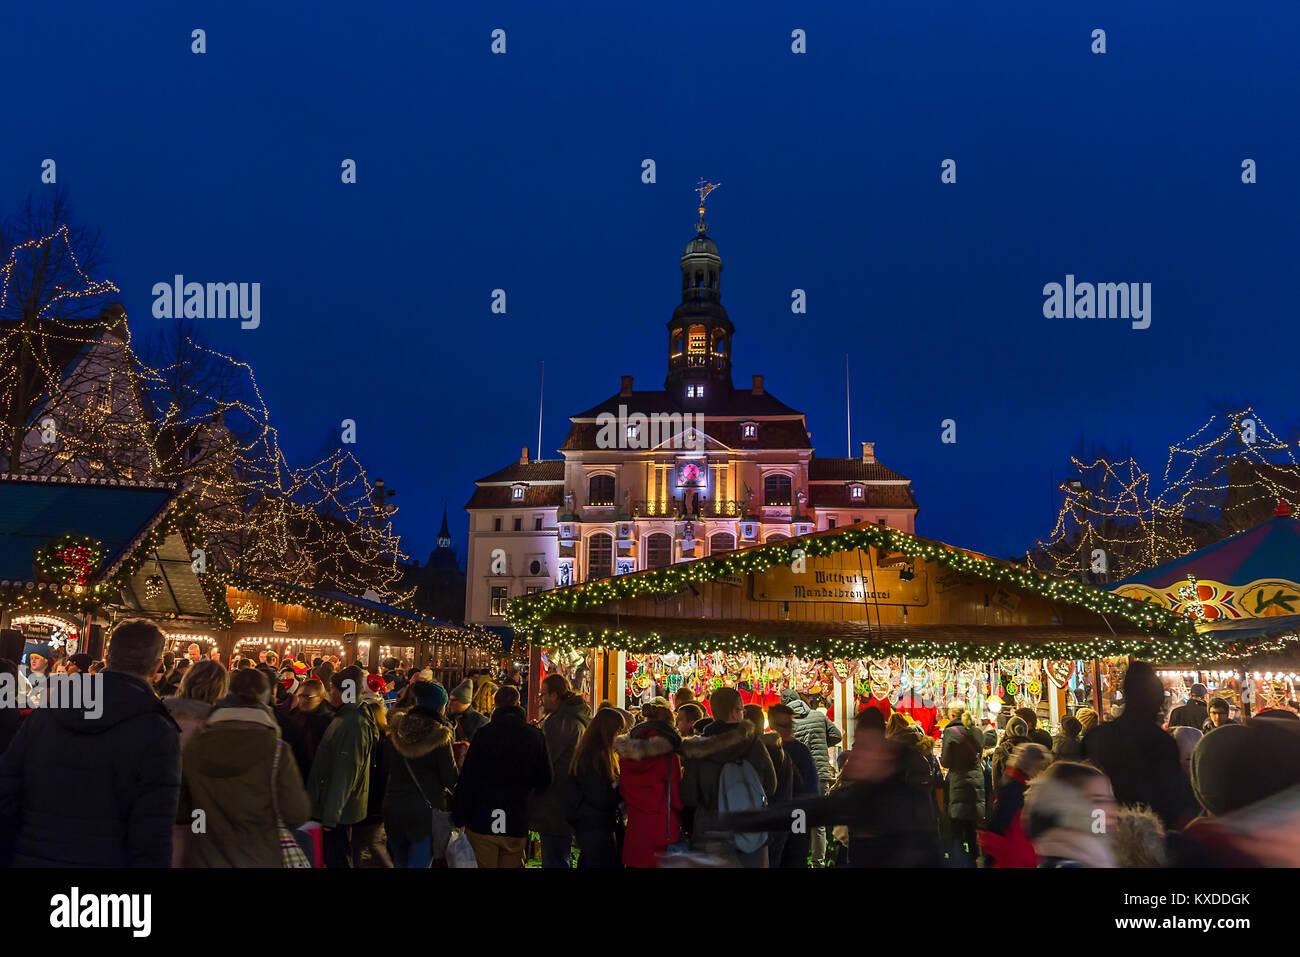 Town hall with Christmas market,colorful illuminated around Christmas time,Lüneburg,Lower Saxony,Germany Stock Photo